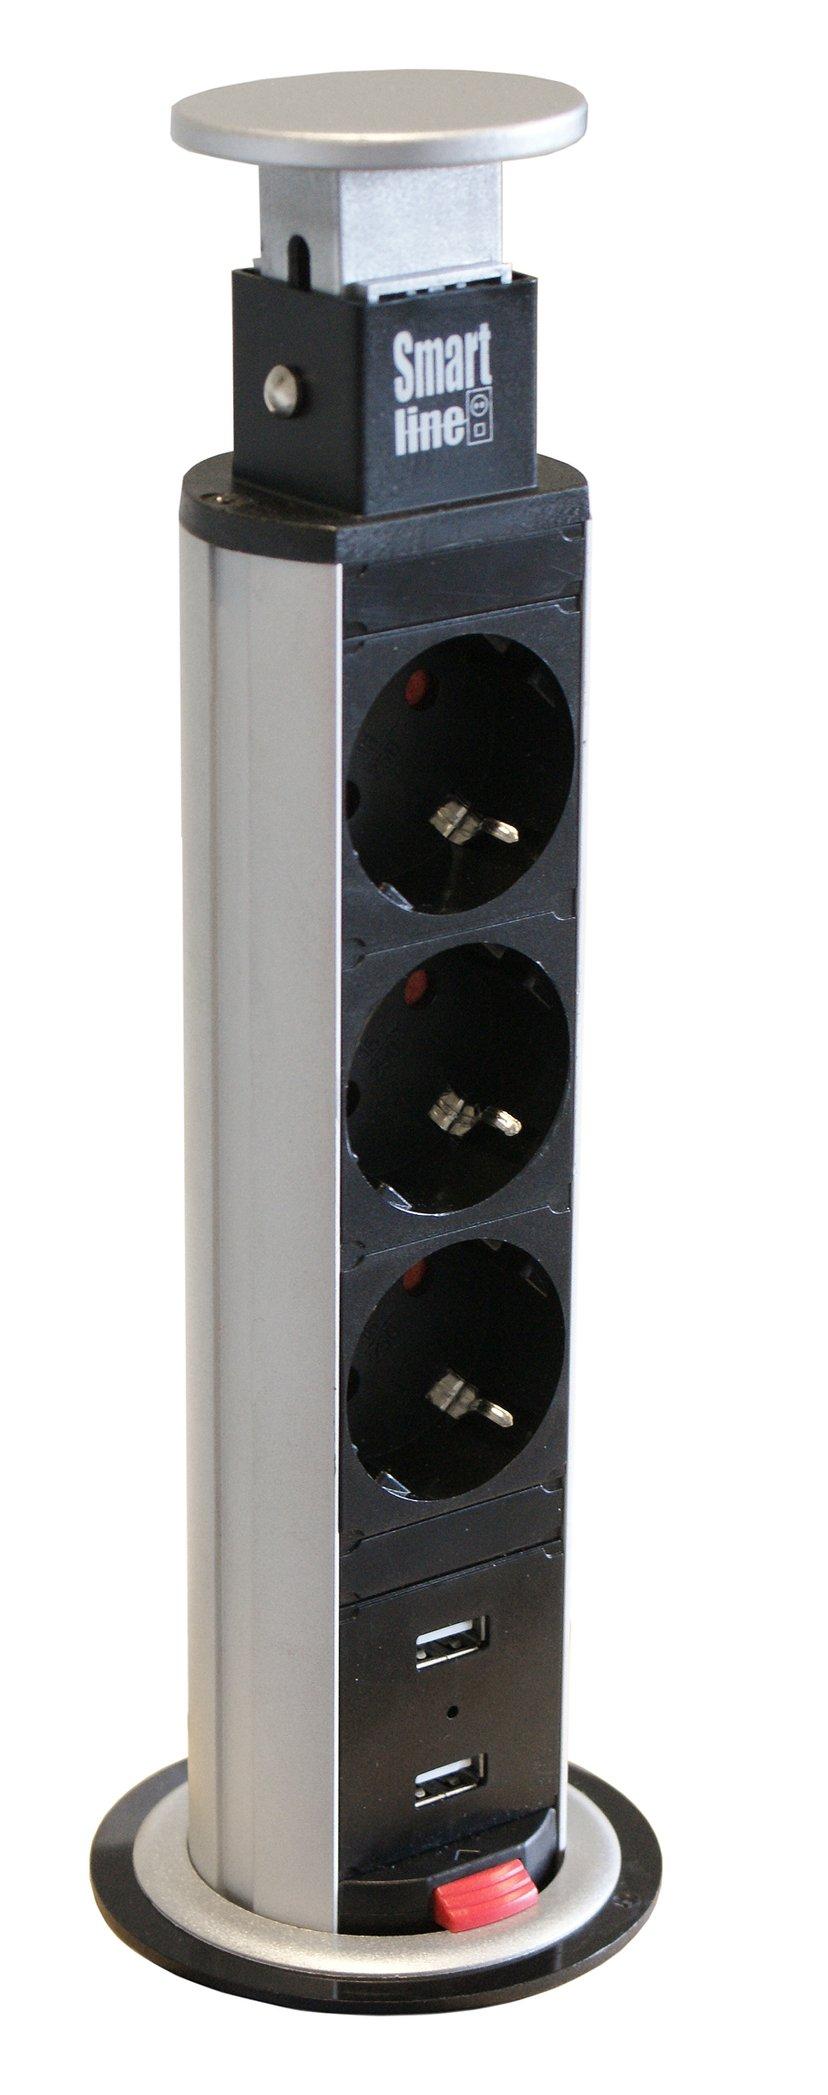 Kondator Smartline Popup Jack 3Xcee 7/4/2xUSB, 1,5m Kabel, Svart/Sølv